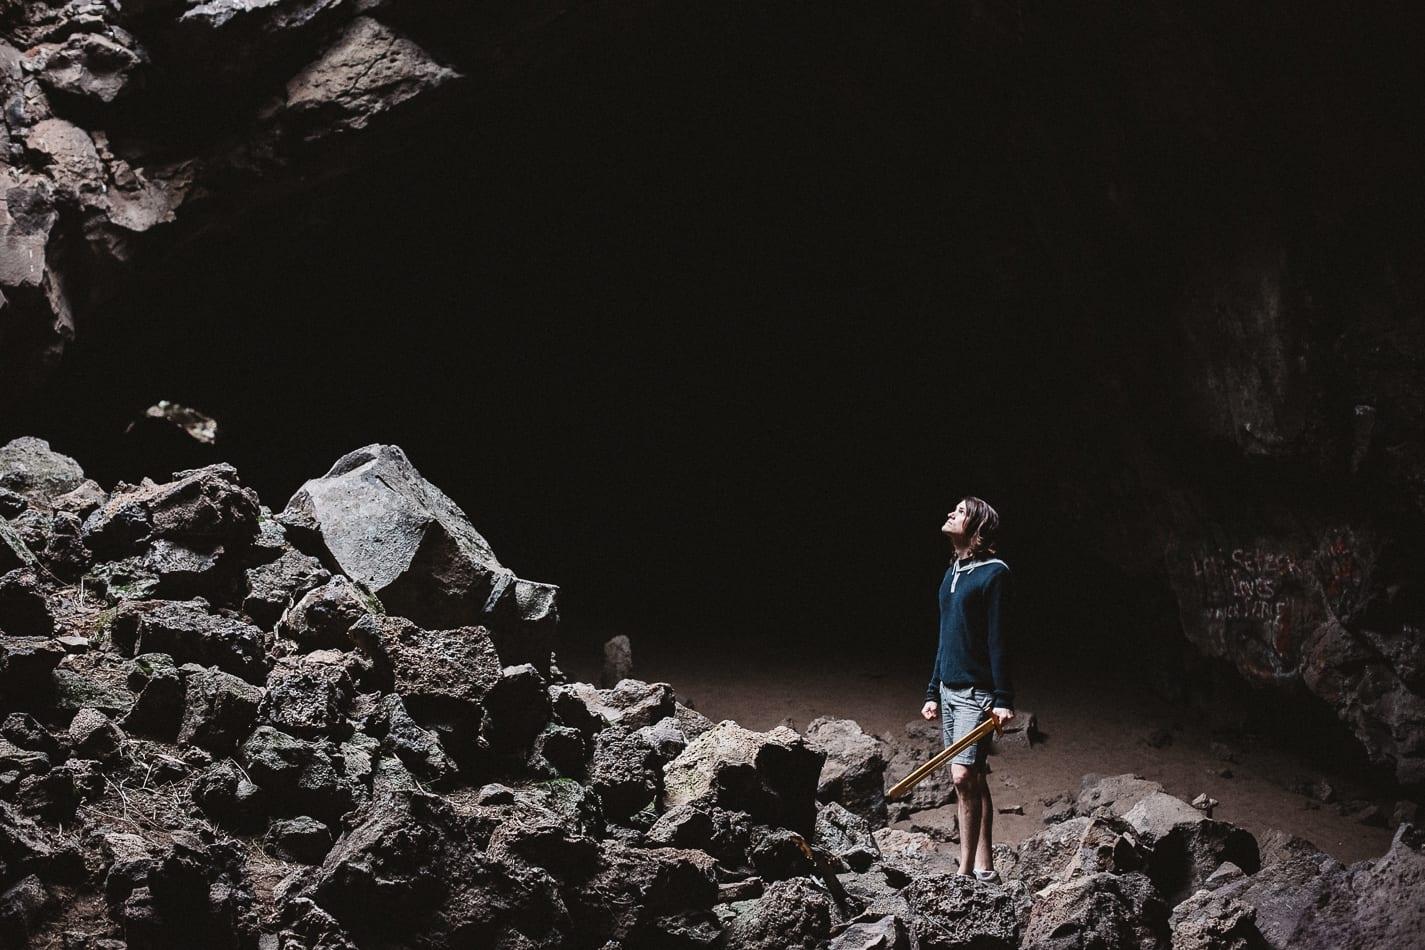 pluto-cave-mount-shasta-lifestyle-portrati-photo-29